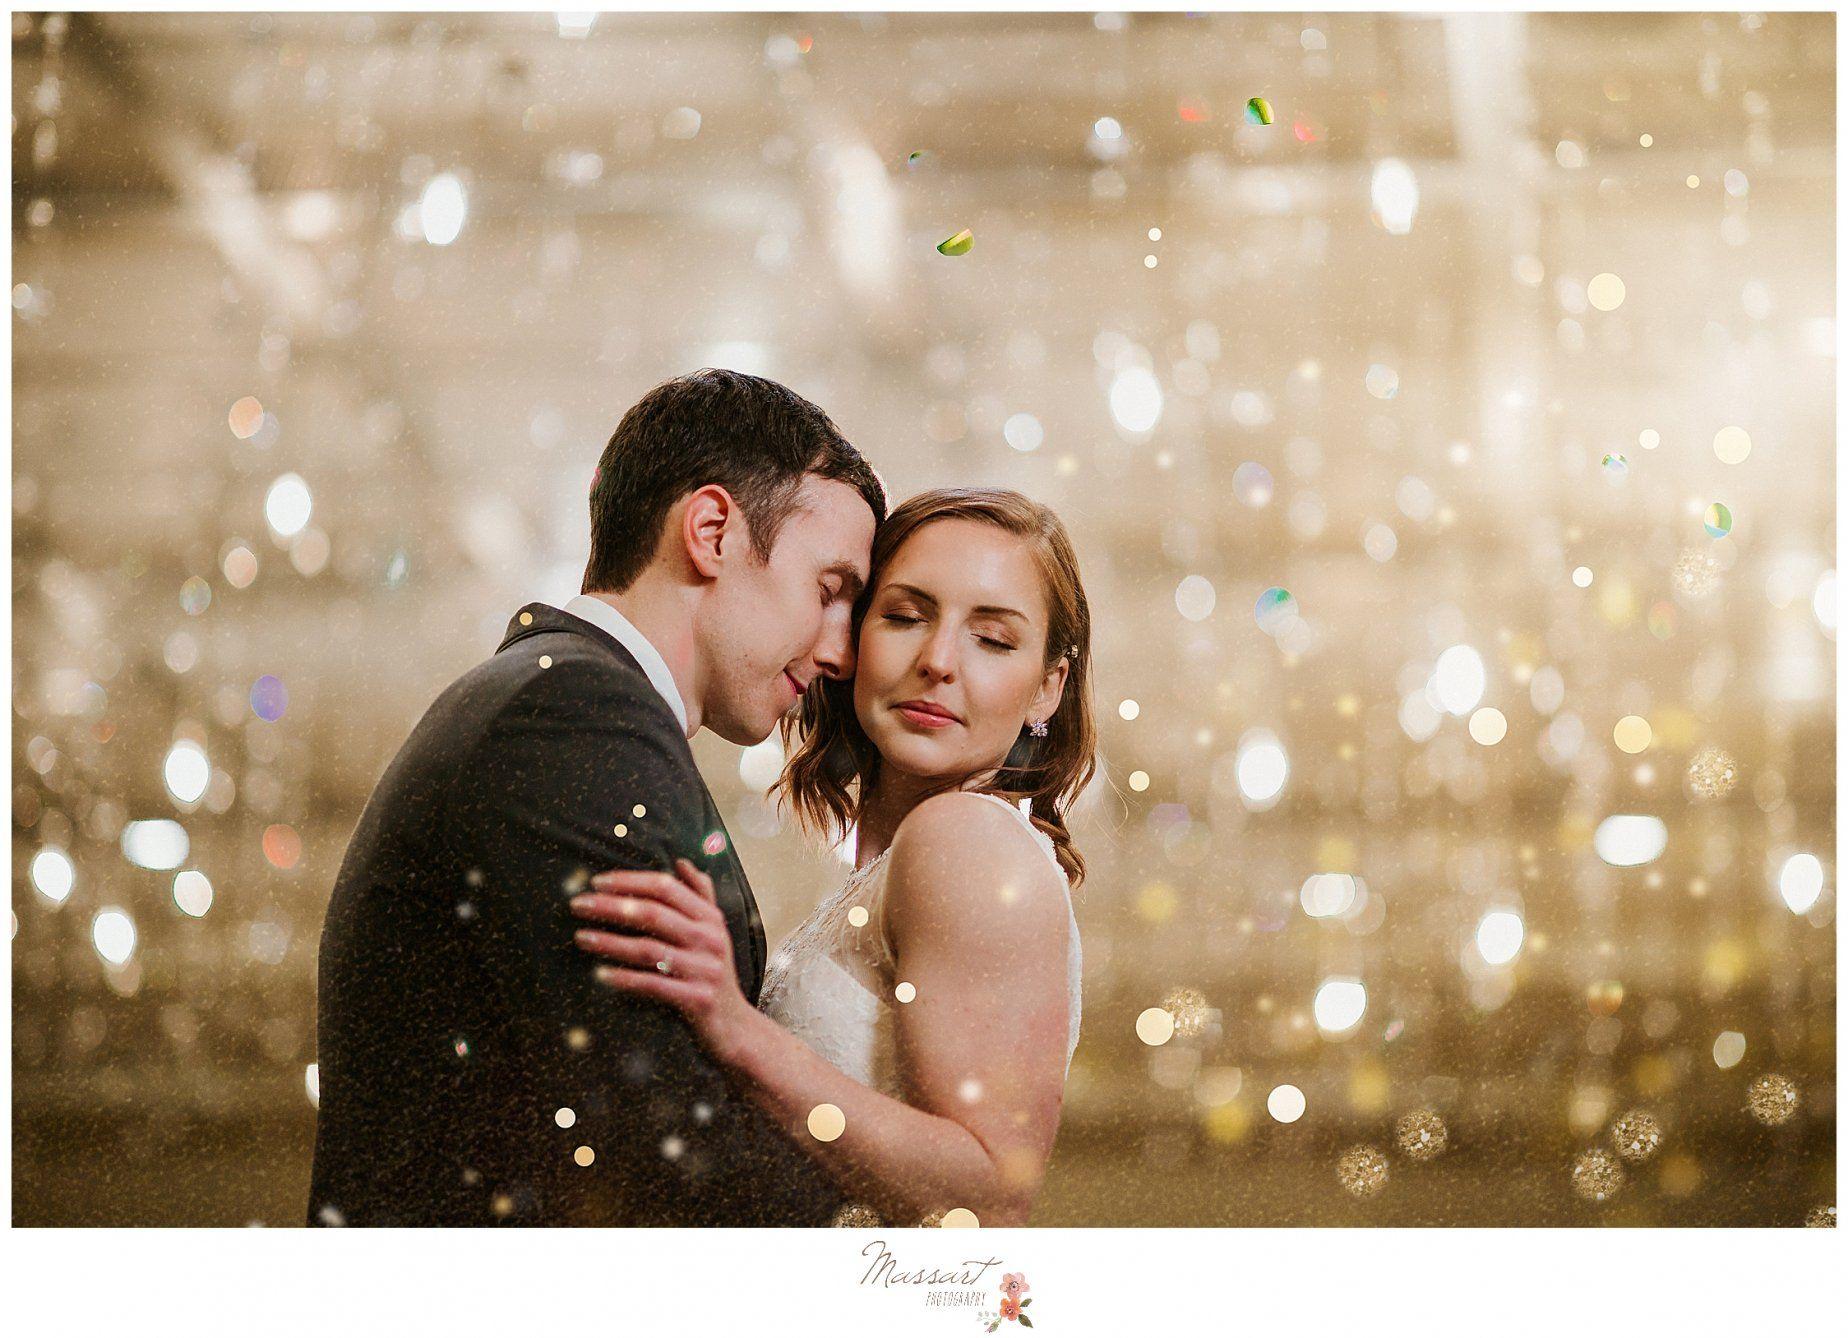 Gold Inspired Wedding Portrait At Atlantic Resort Newport Photographed By Massart Photography Newport Wedding Wedding Photographers Top Wedding Photographers